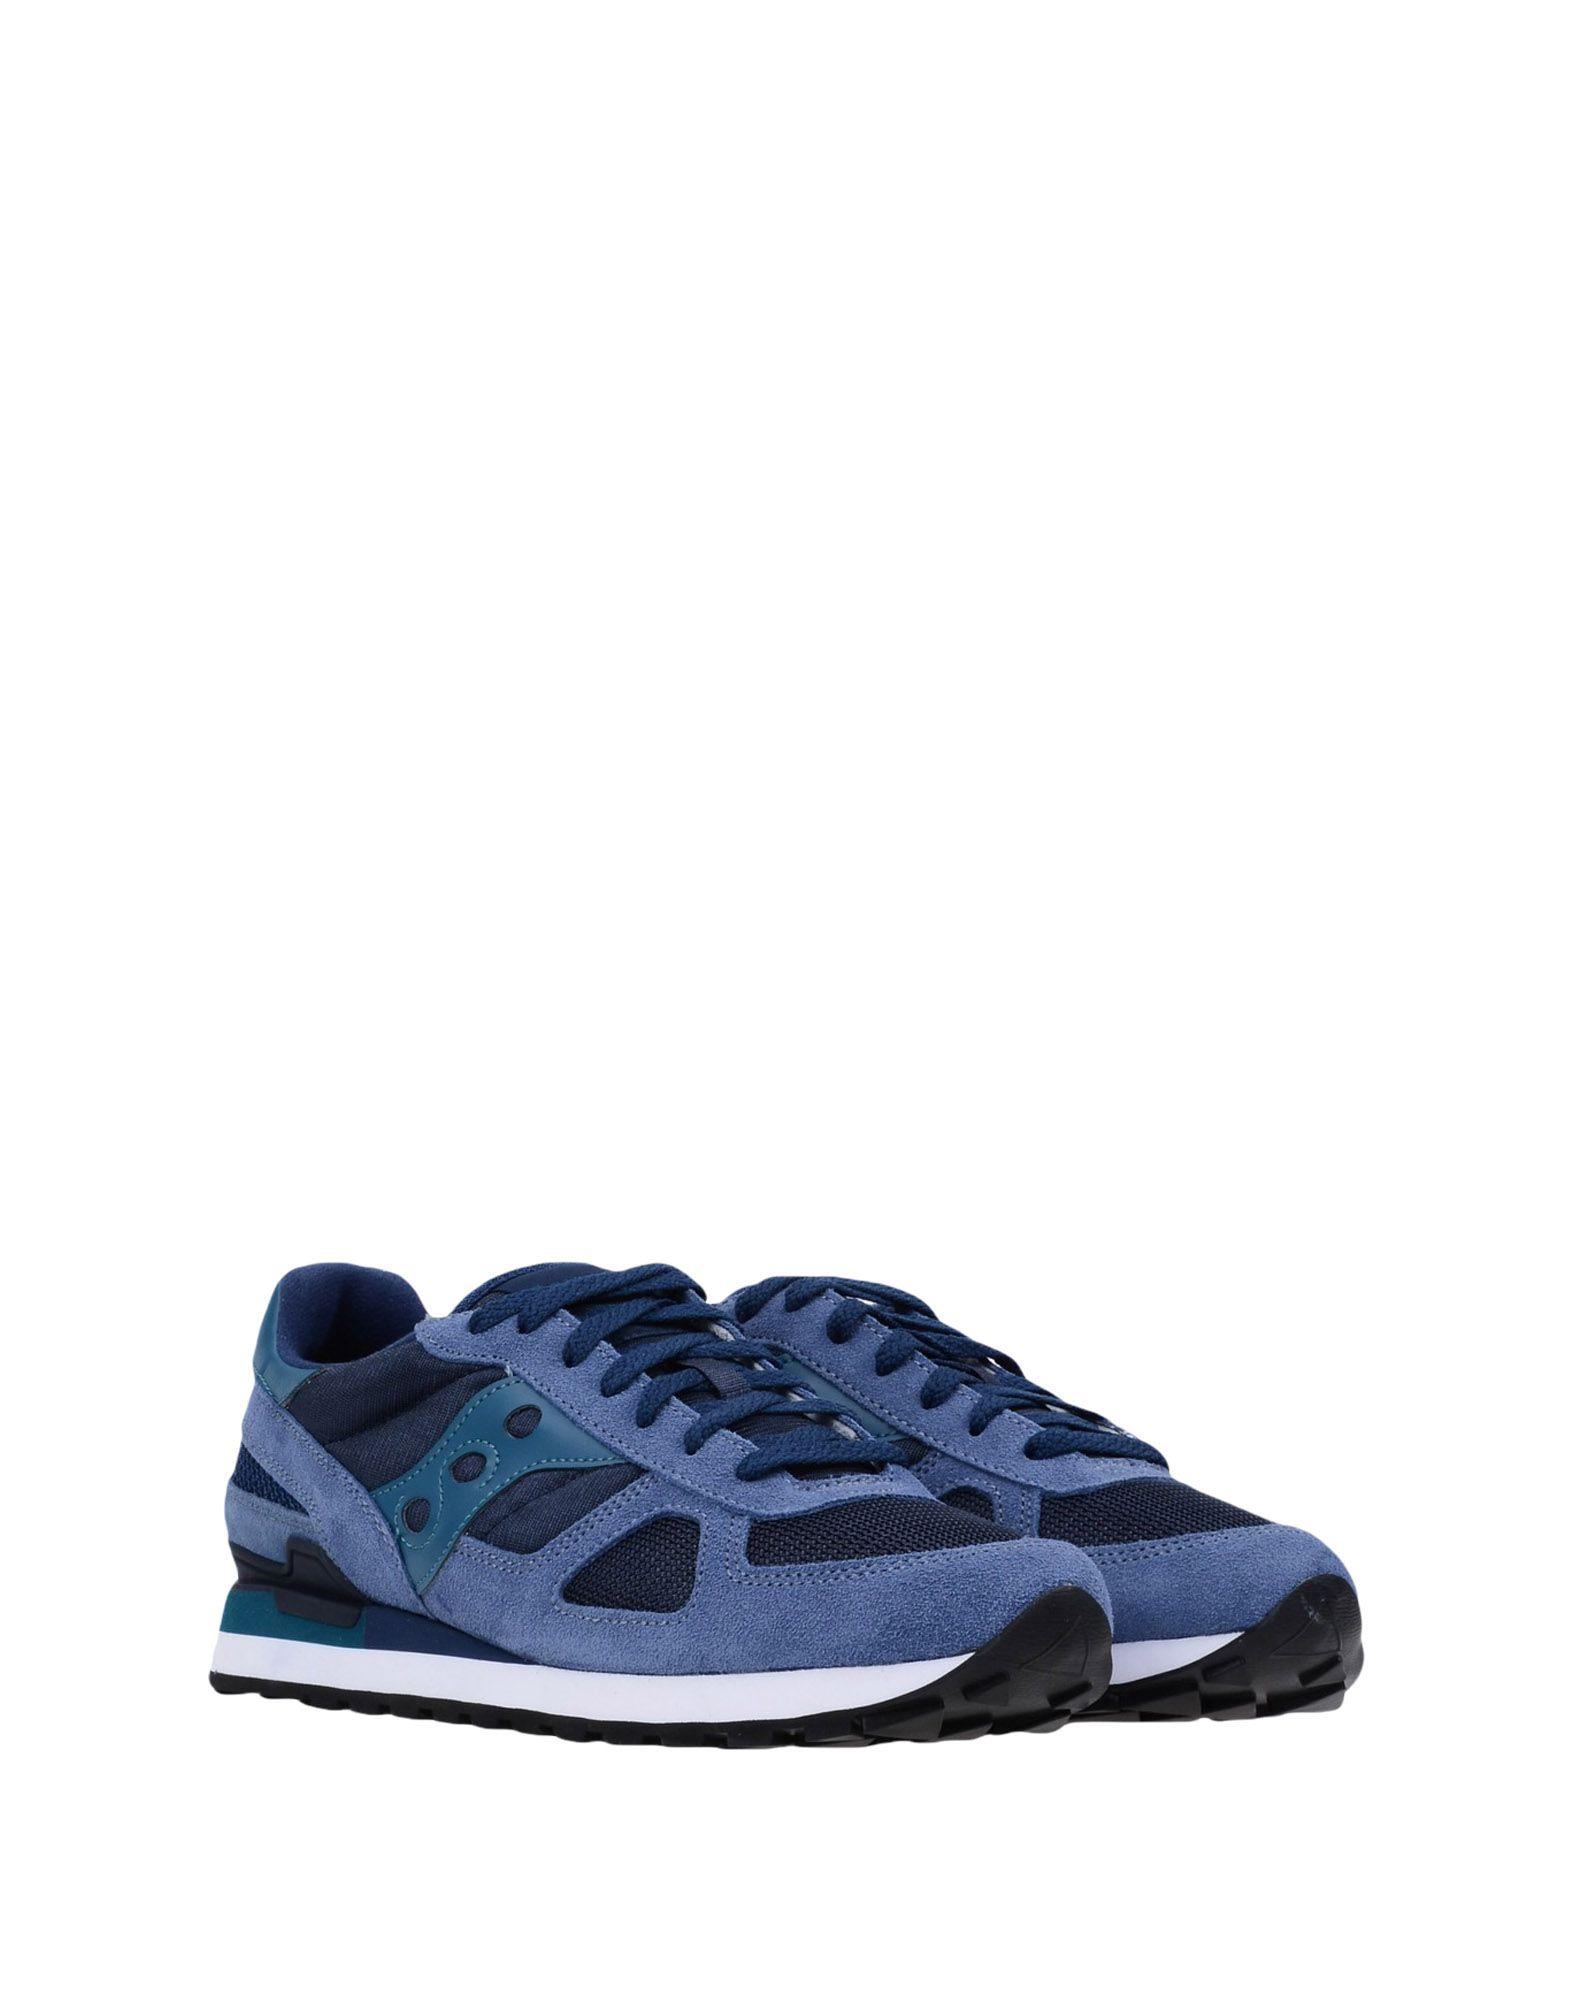 Rabatt echte  Schuhe Saucony Shadow Original  echte 11329250UL 0386bb